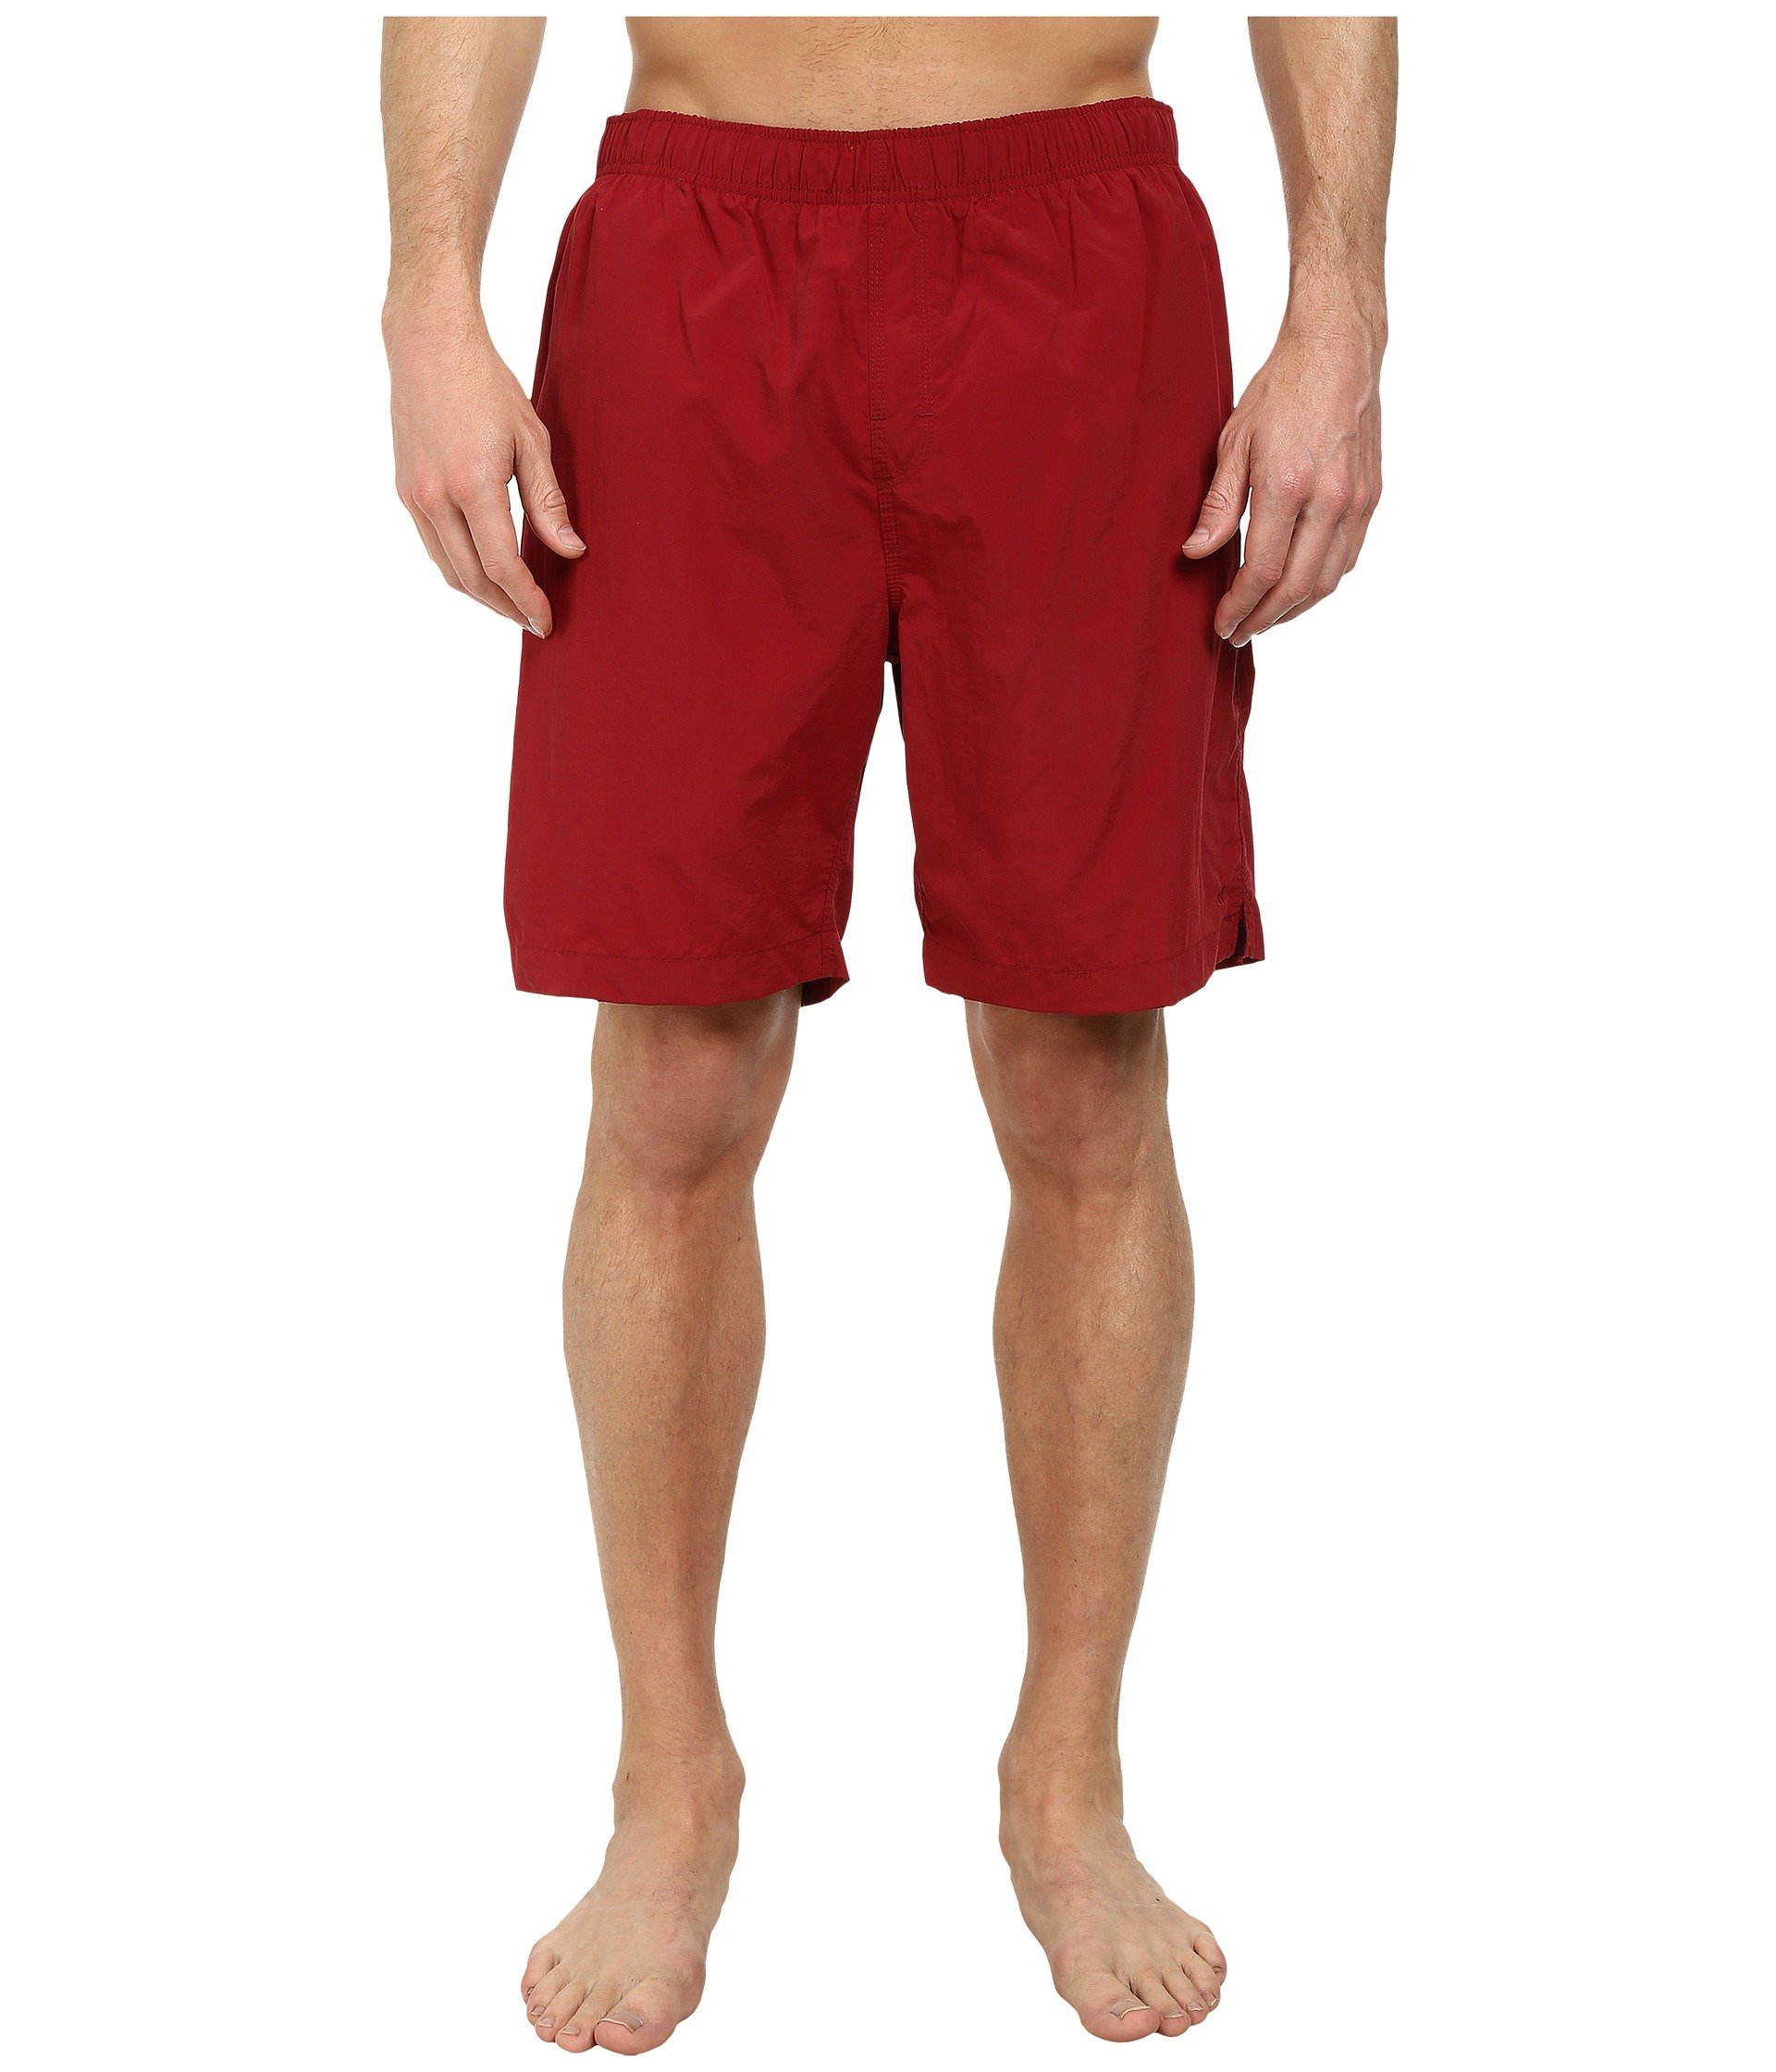 Pantaloneta para Hombre White Sierra So Cal Short  + White Sierra en VeoyCompro.net